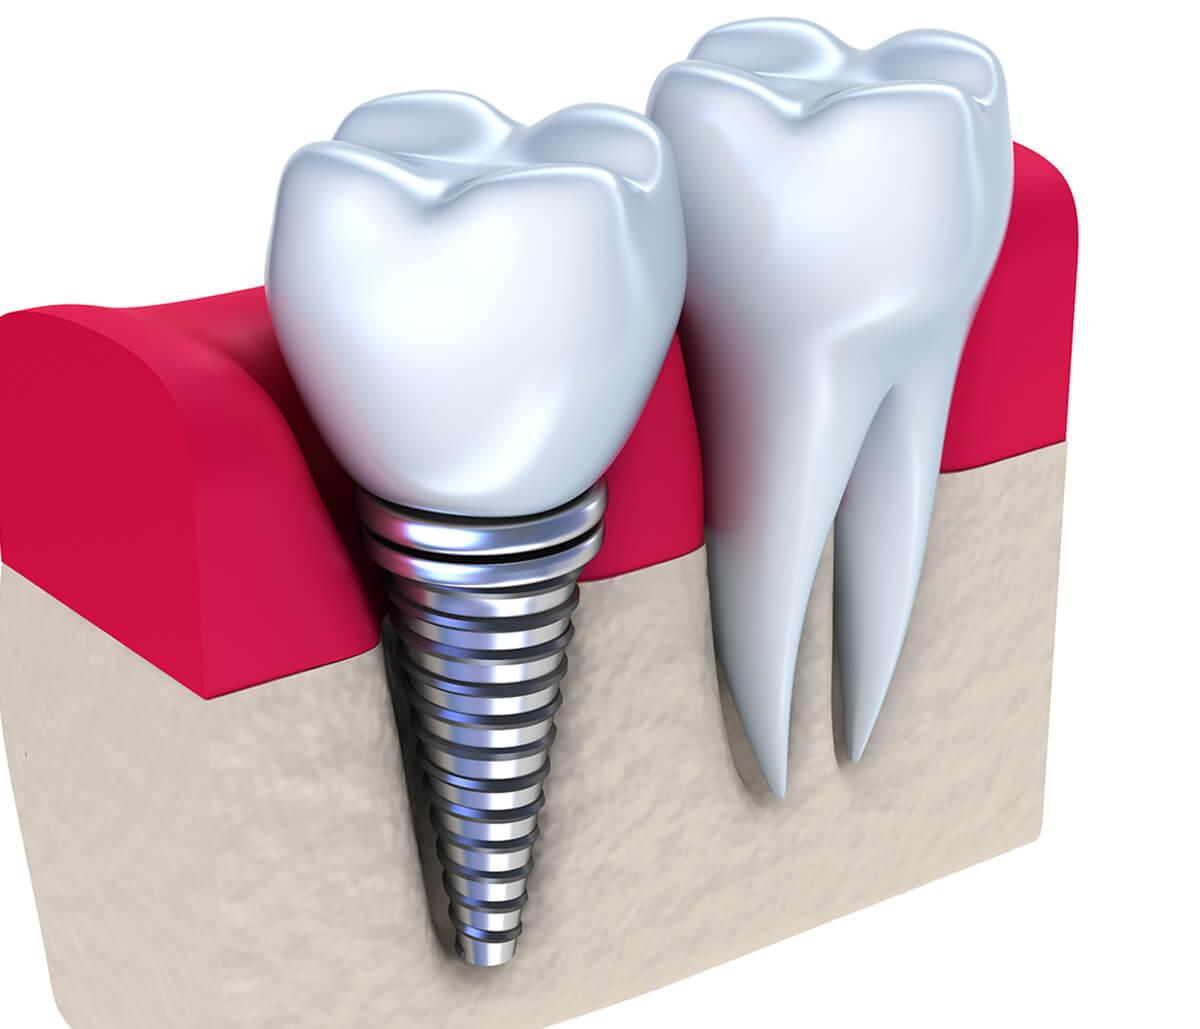 Dental Implants Dentist in Houston Texas Area